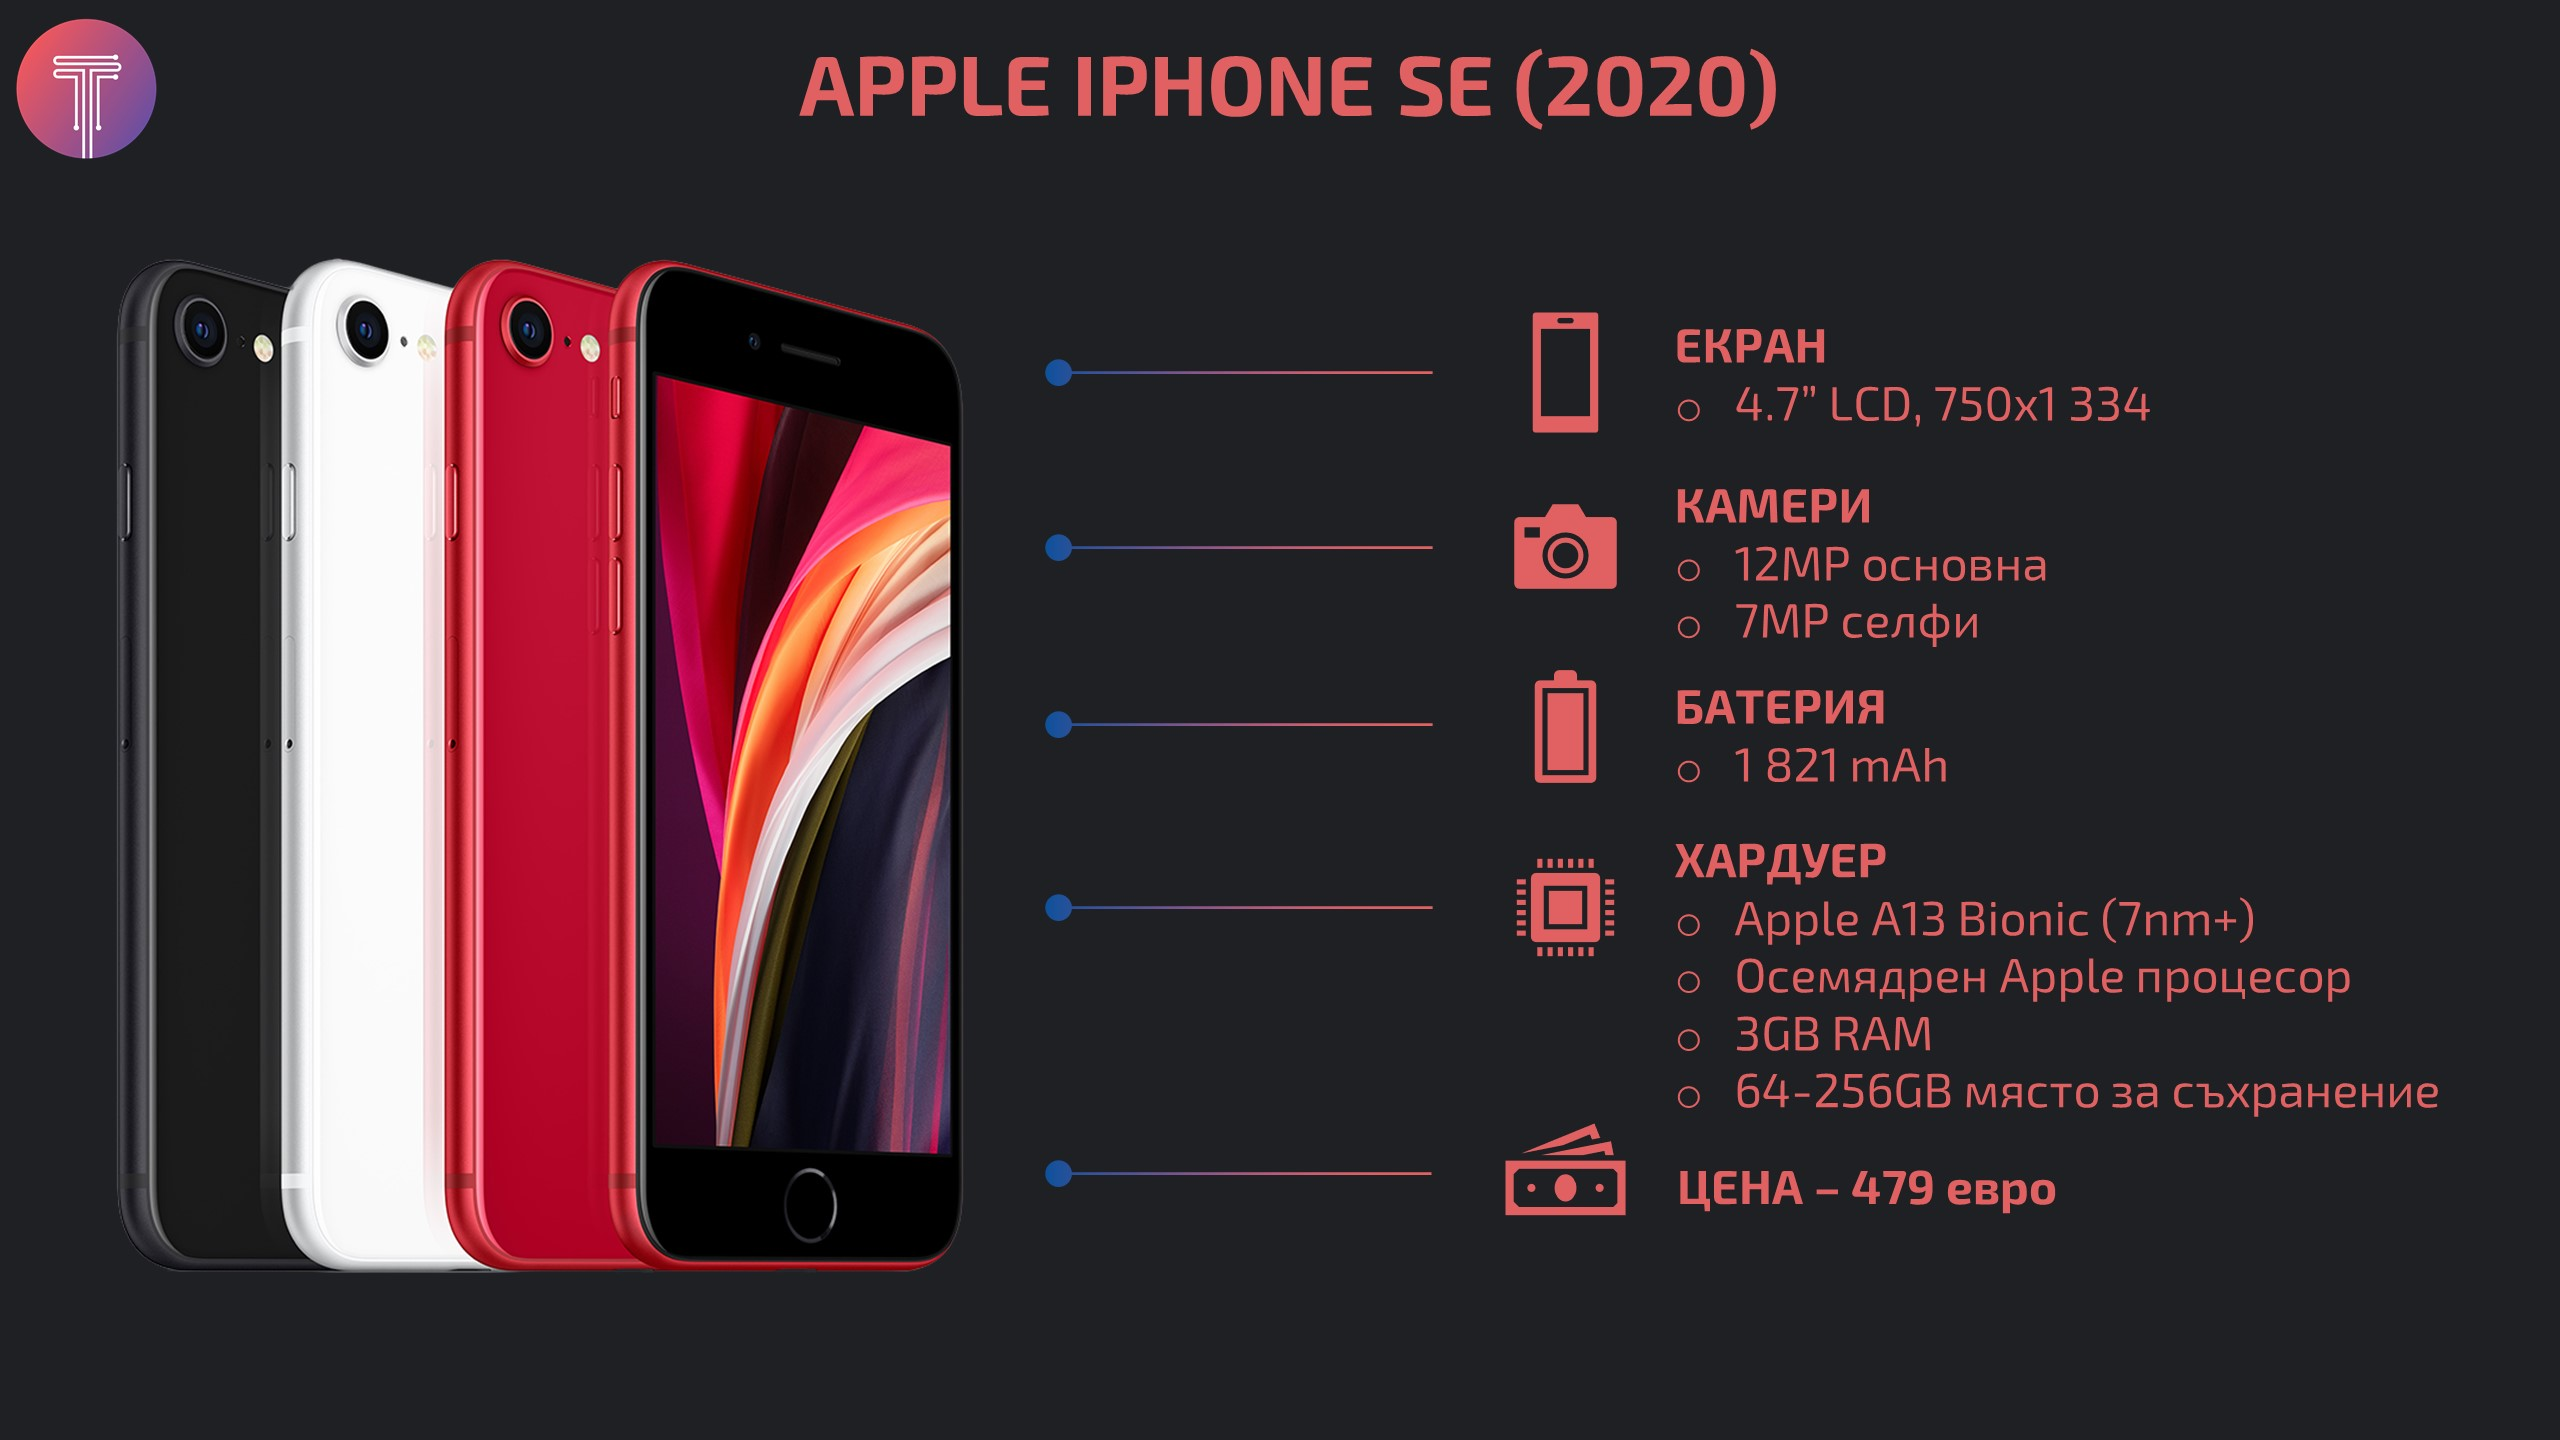 iphone-se-2020-infographic-edited